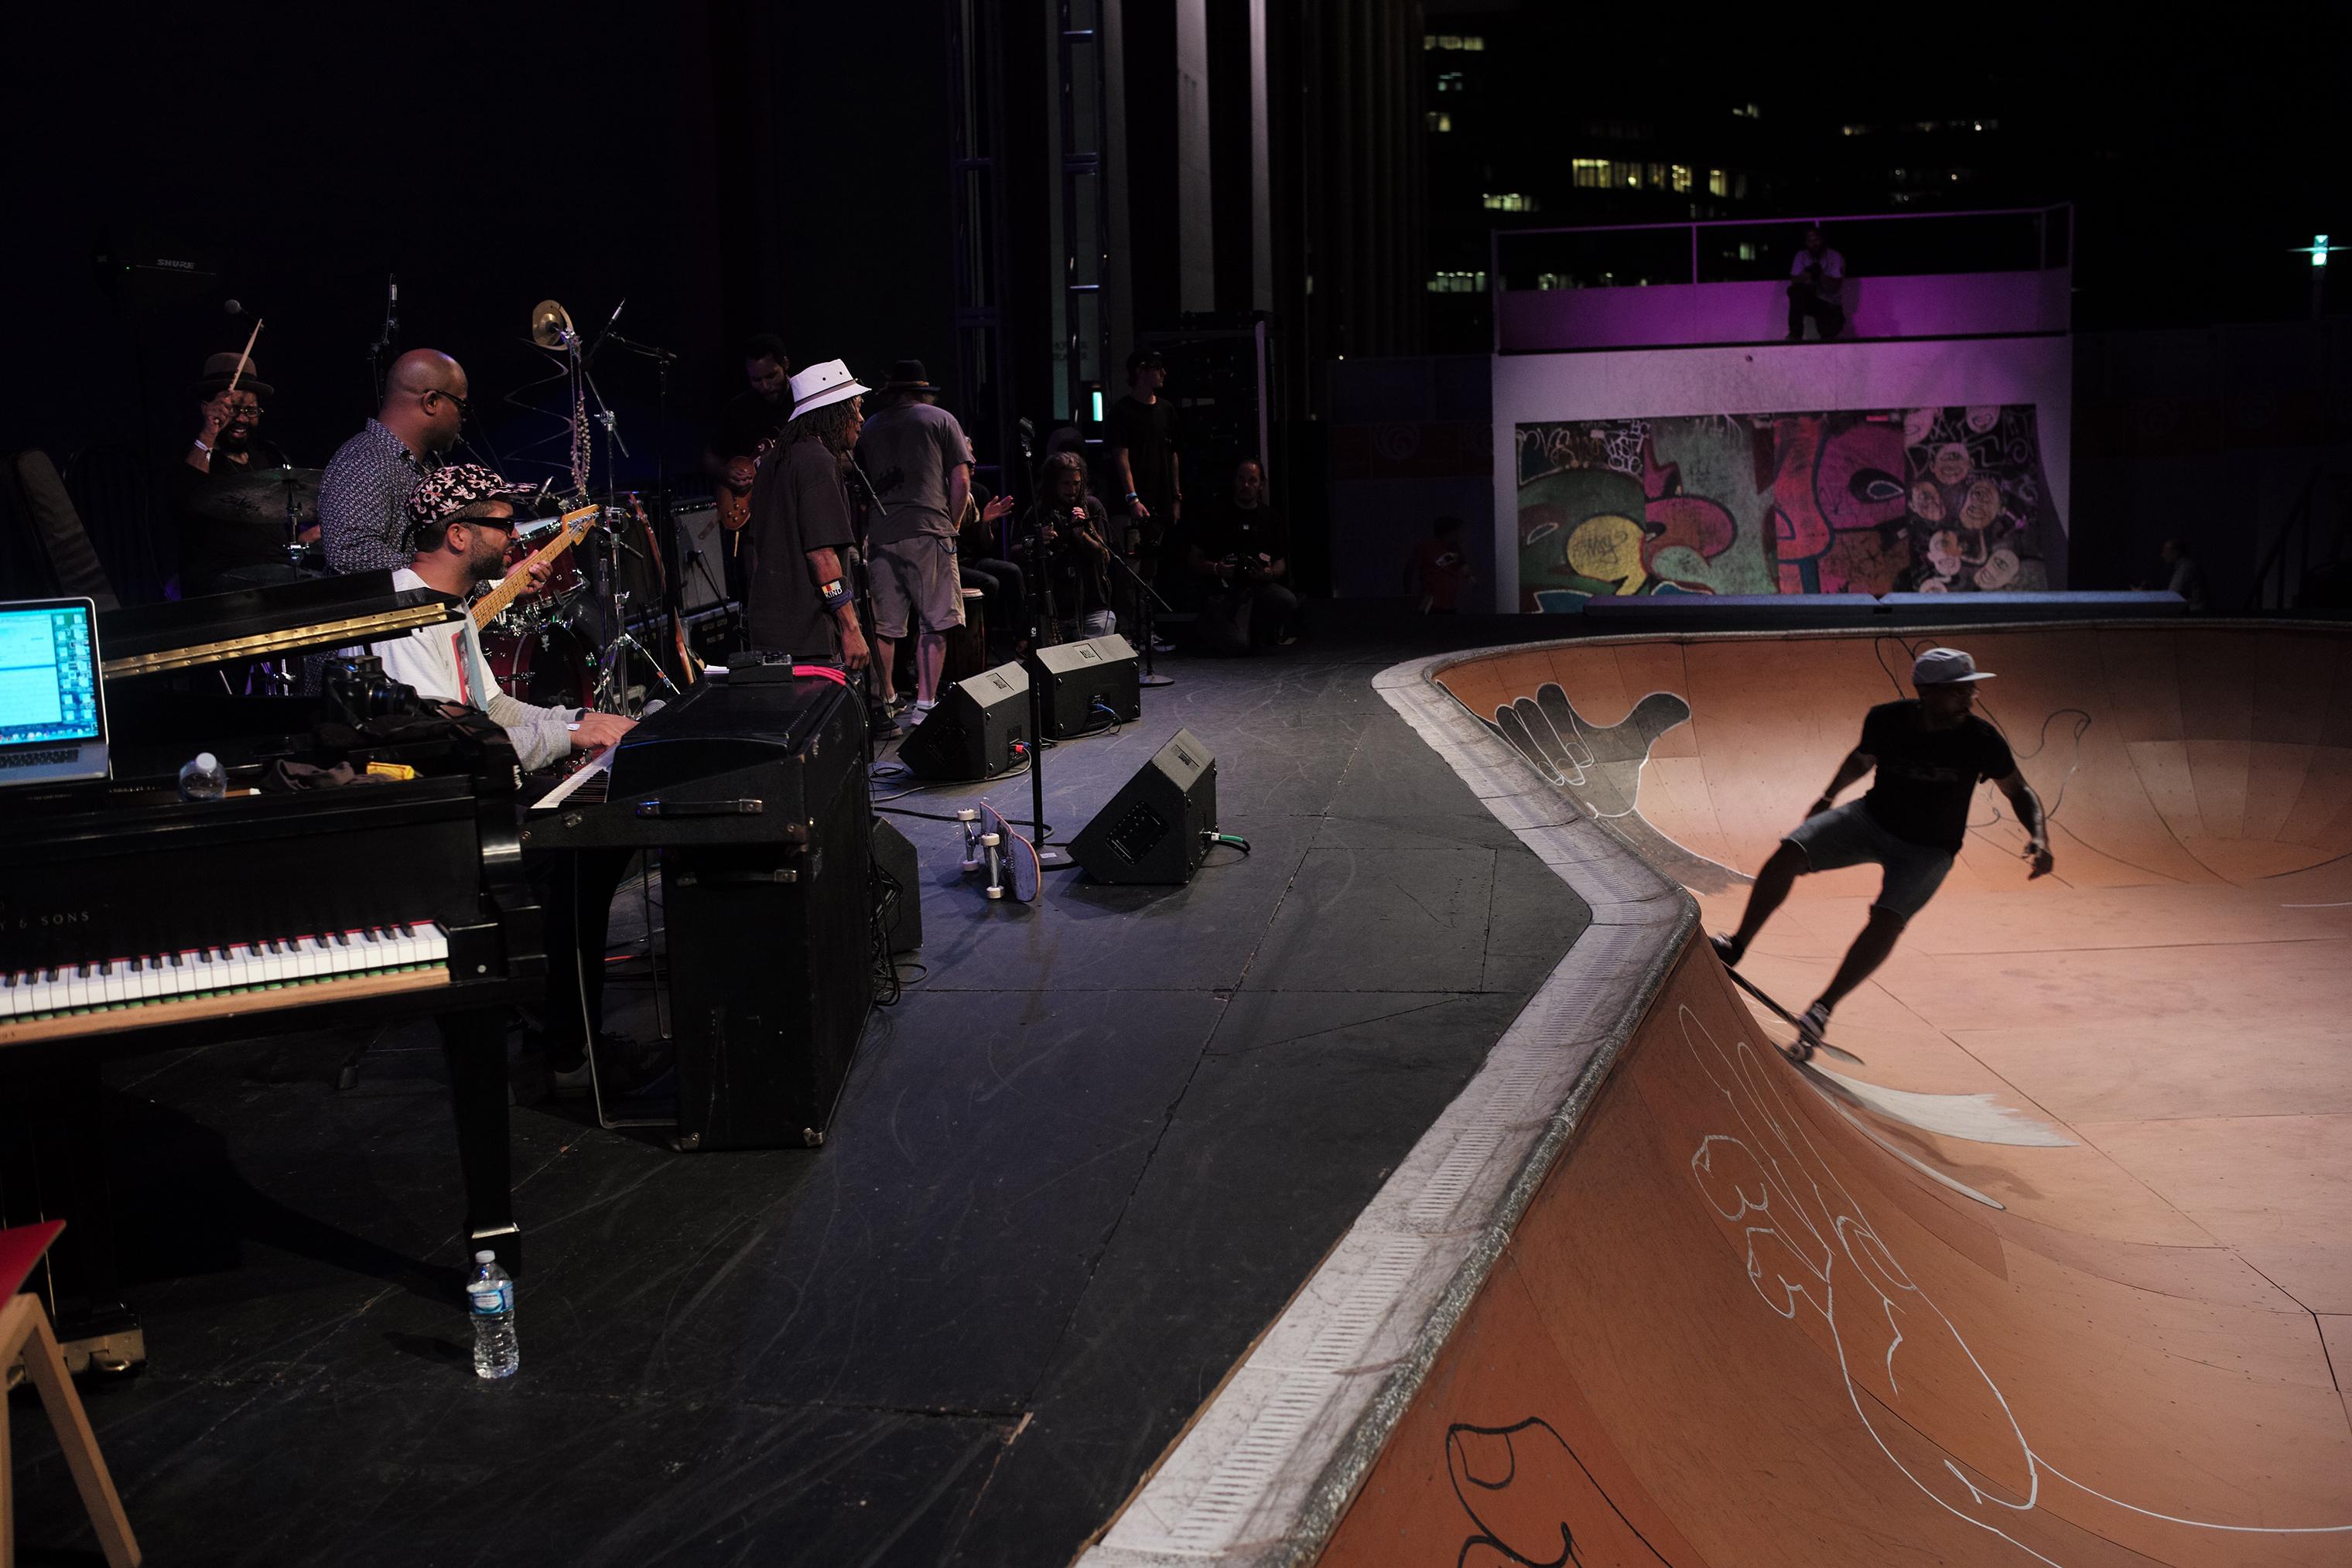 Jason Moran and the Bandwagon play alongside skateboarder Chuck Treece